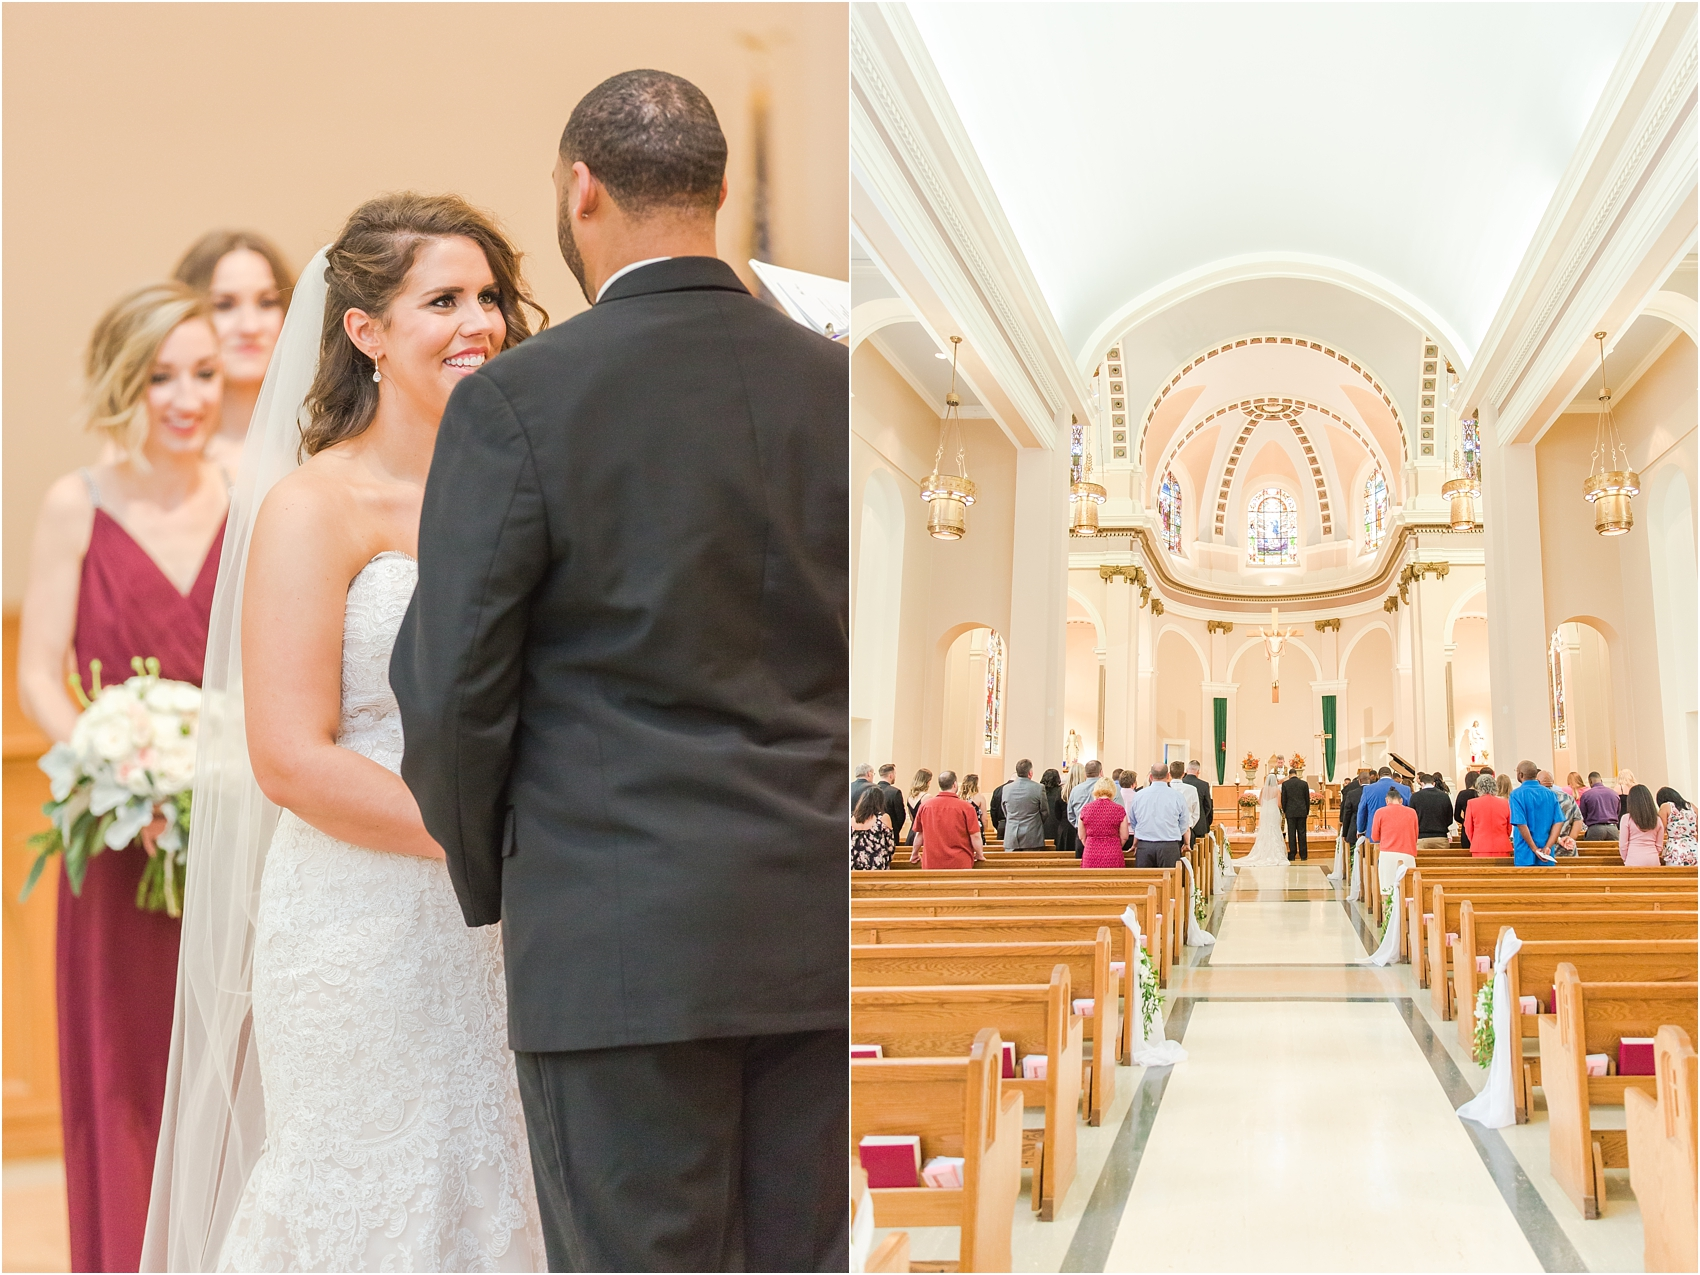 elegant-and-romantic-fall-wedding-photos-at-st-marys-catholic-church-in-monroe-michigan-by-courtney-carolyn-photography_0018.jpg